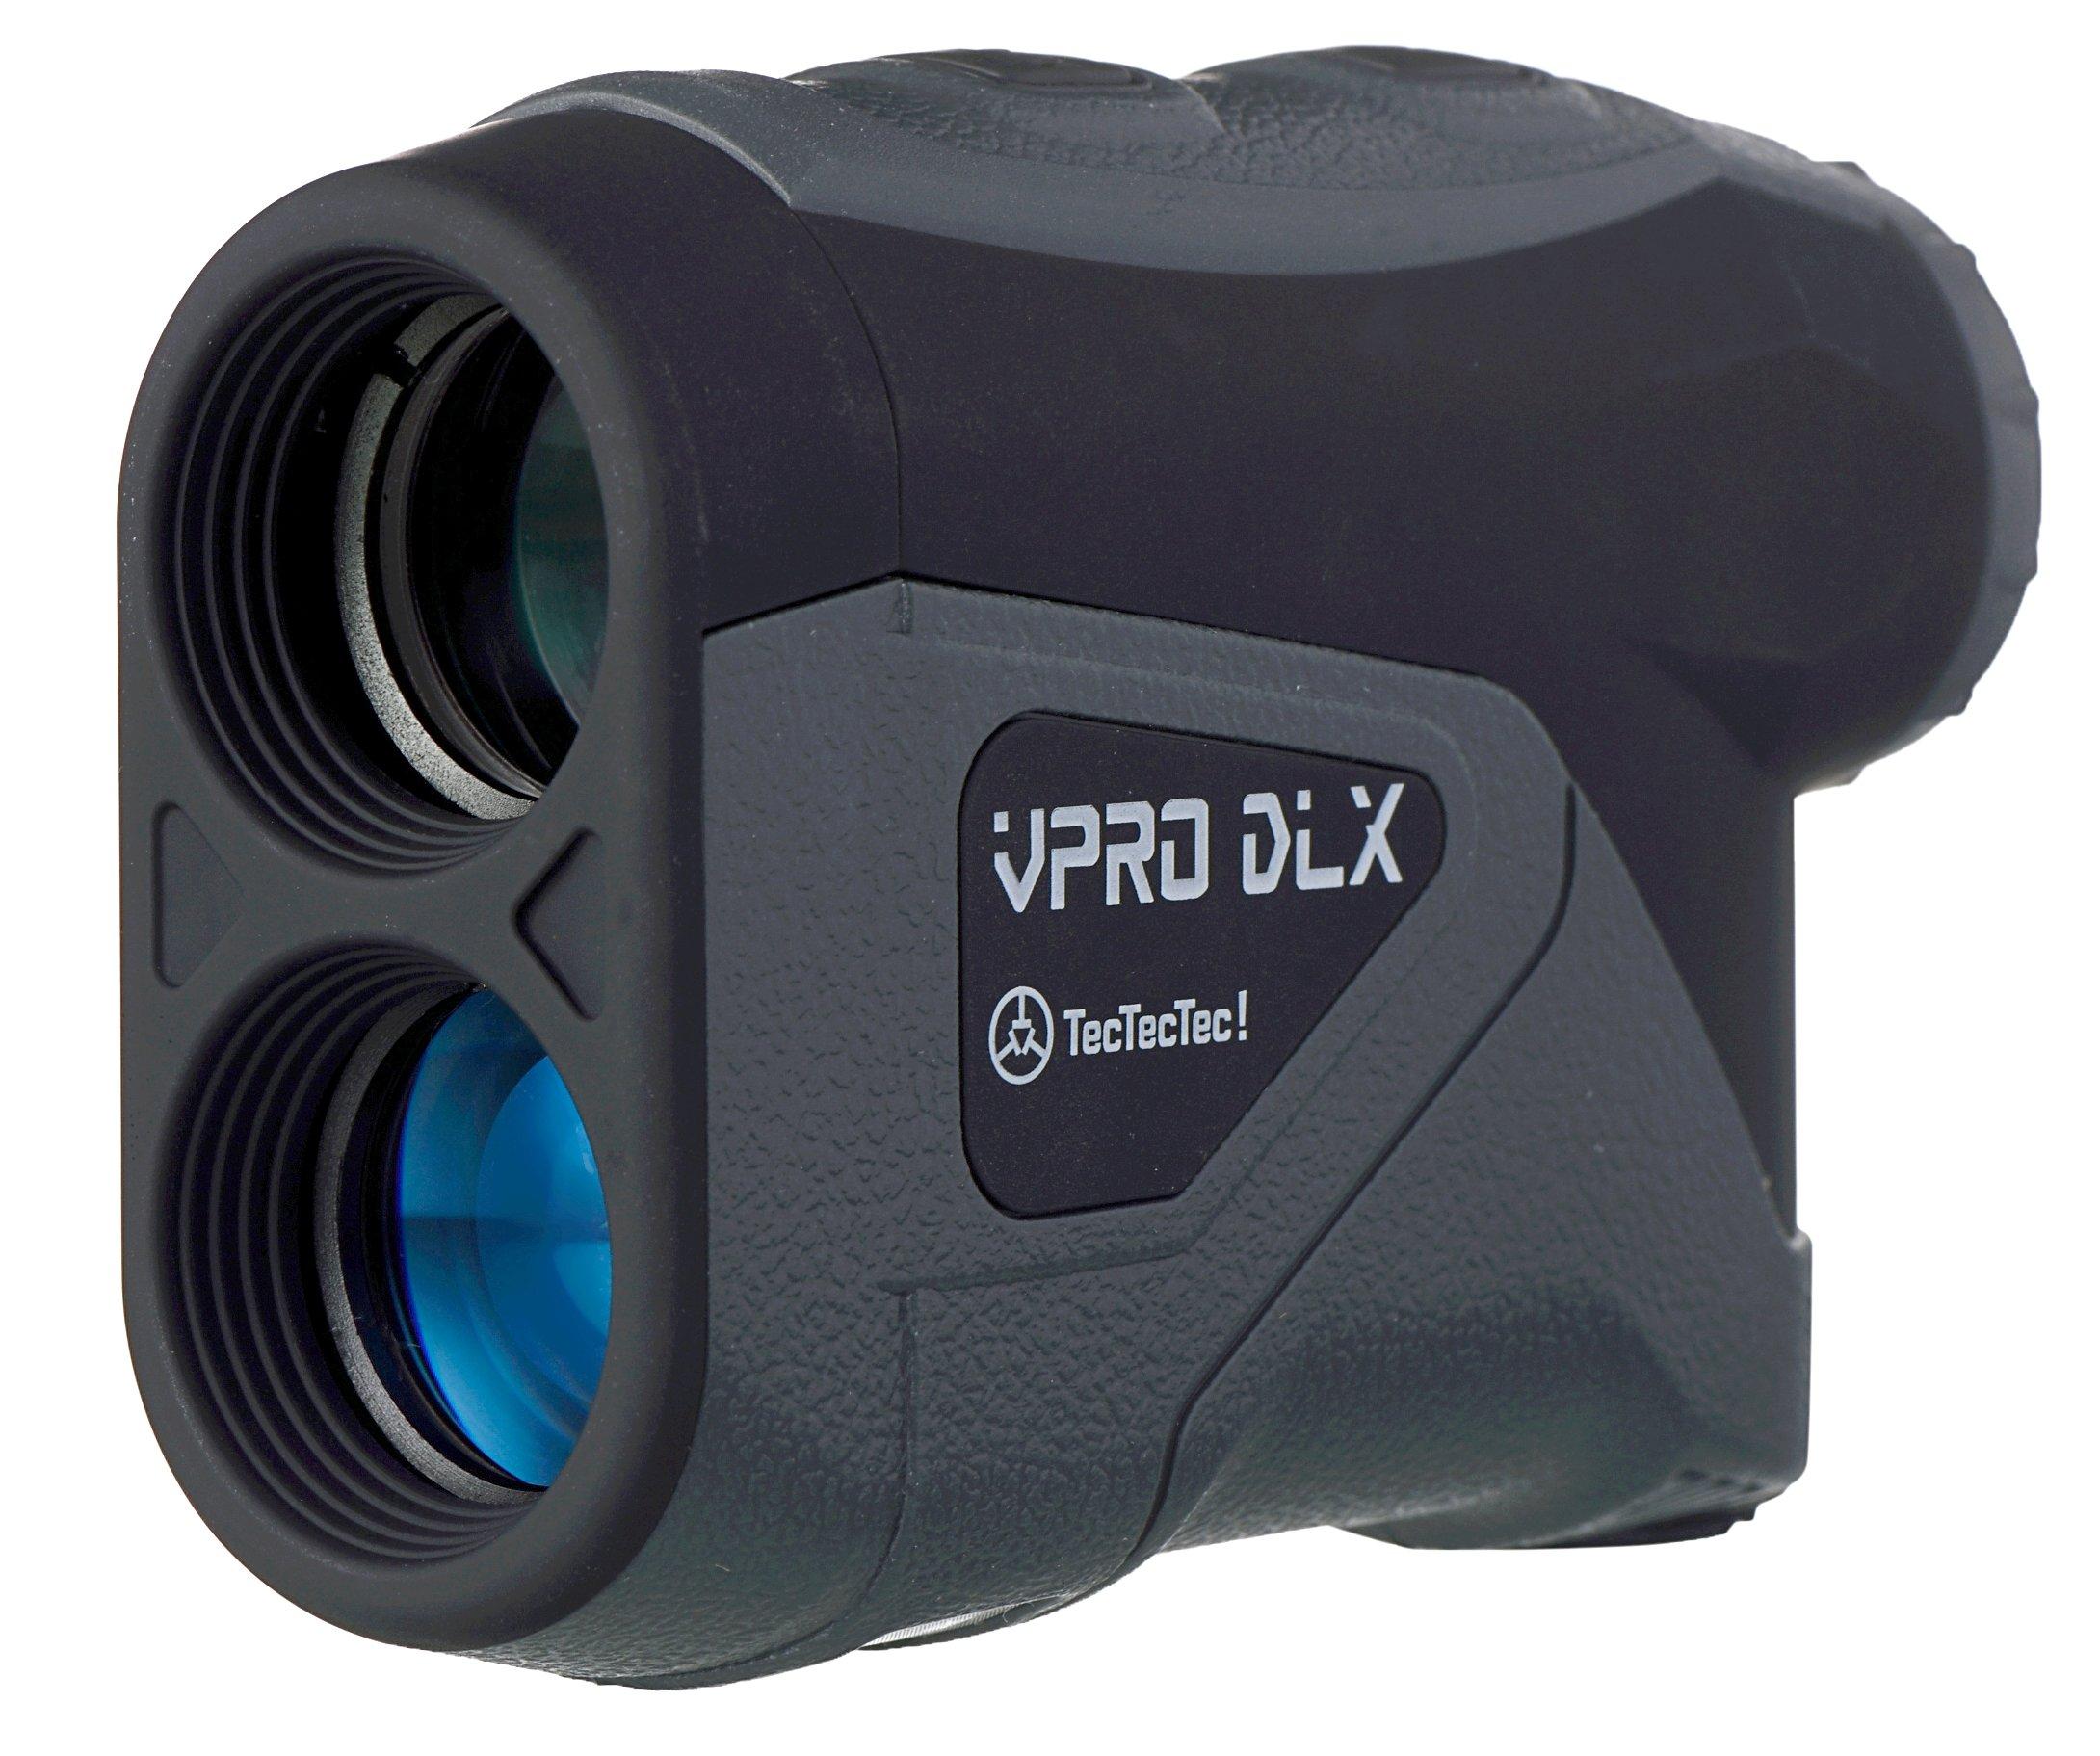 TecTecTec VPRO DLX Golf Rangefinder - Waterproof Laser Range Finder